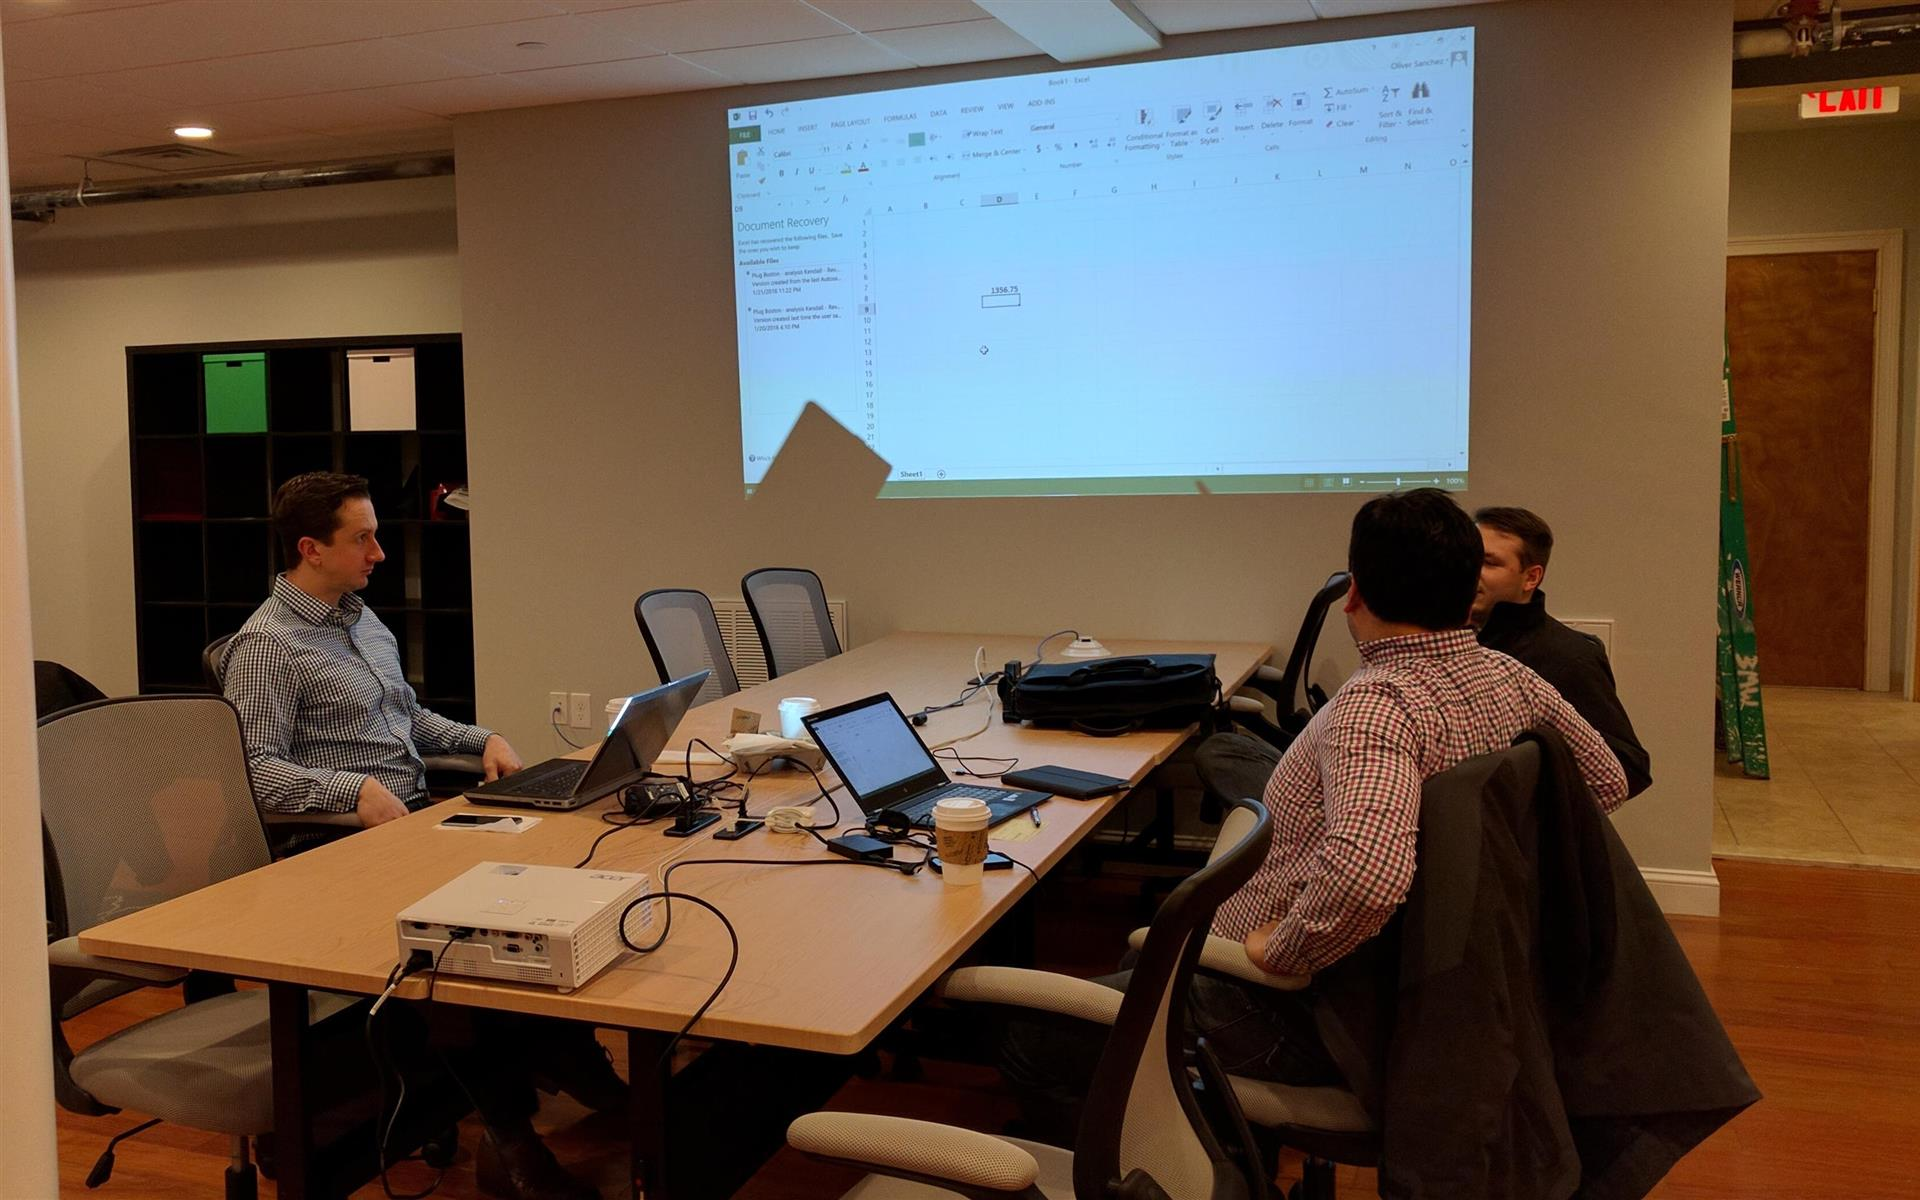 Plug Cambridge Coworking - Dedicated Desk for a team of 2 (Copy)